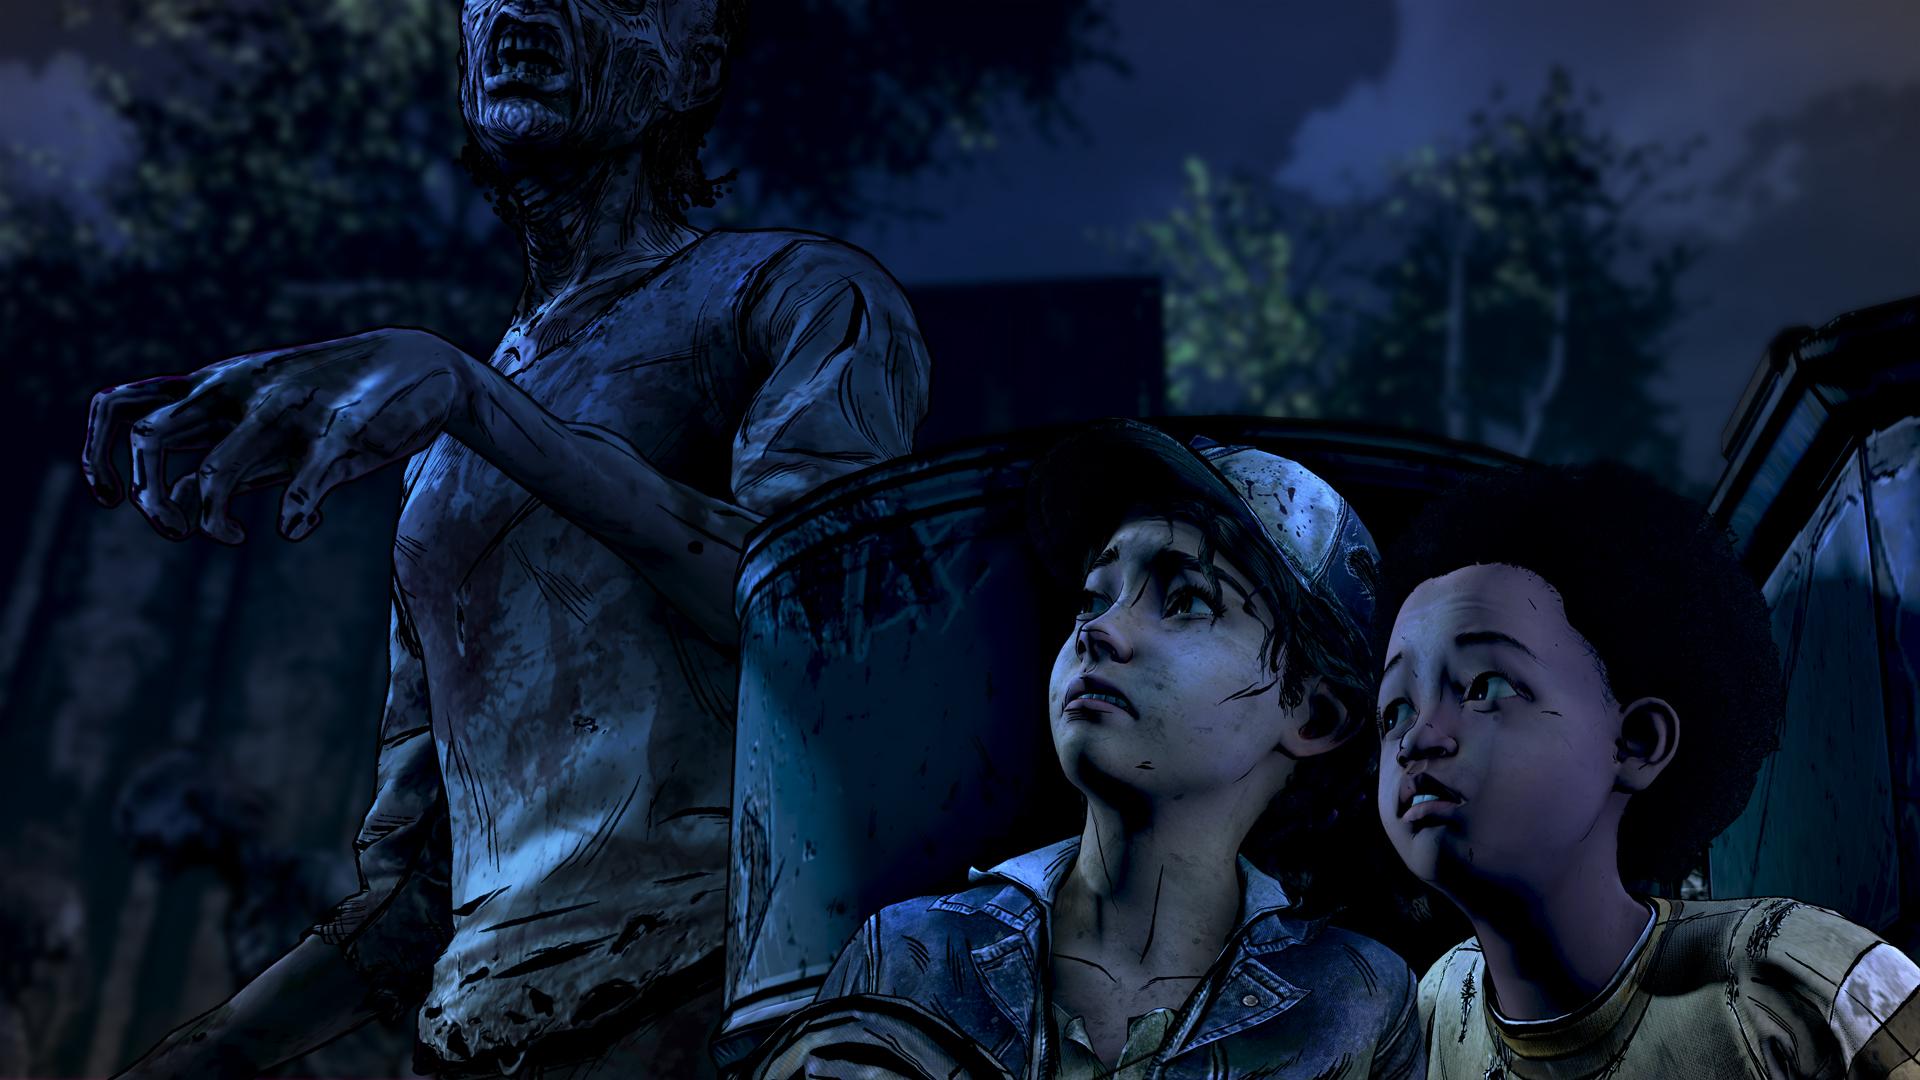 Telltale《行尸走肉》全四季将重新上架Steam商城